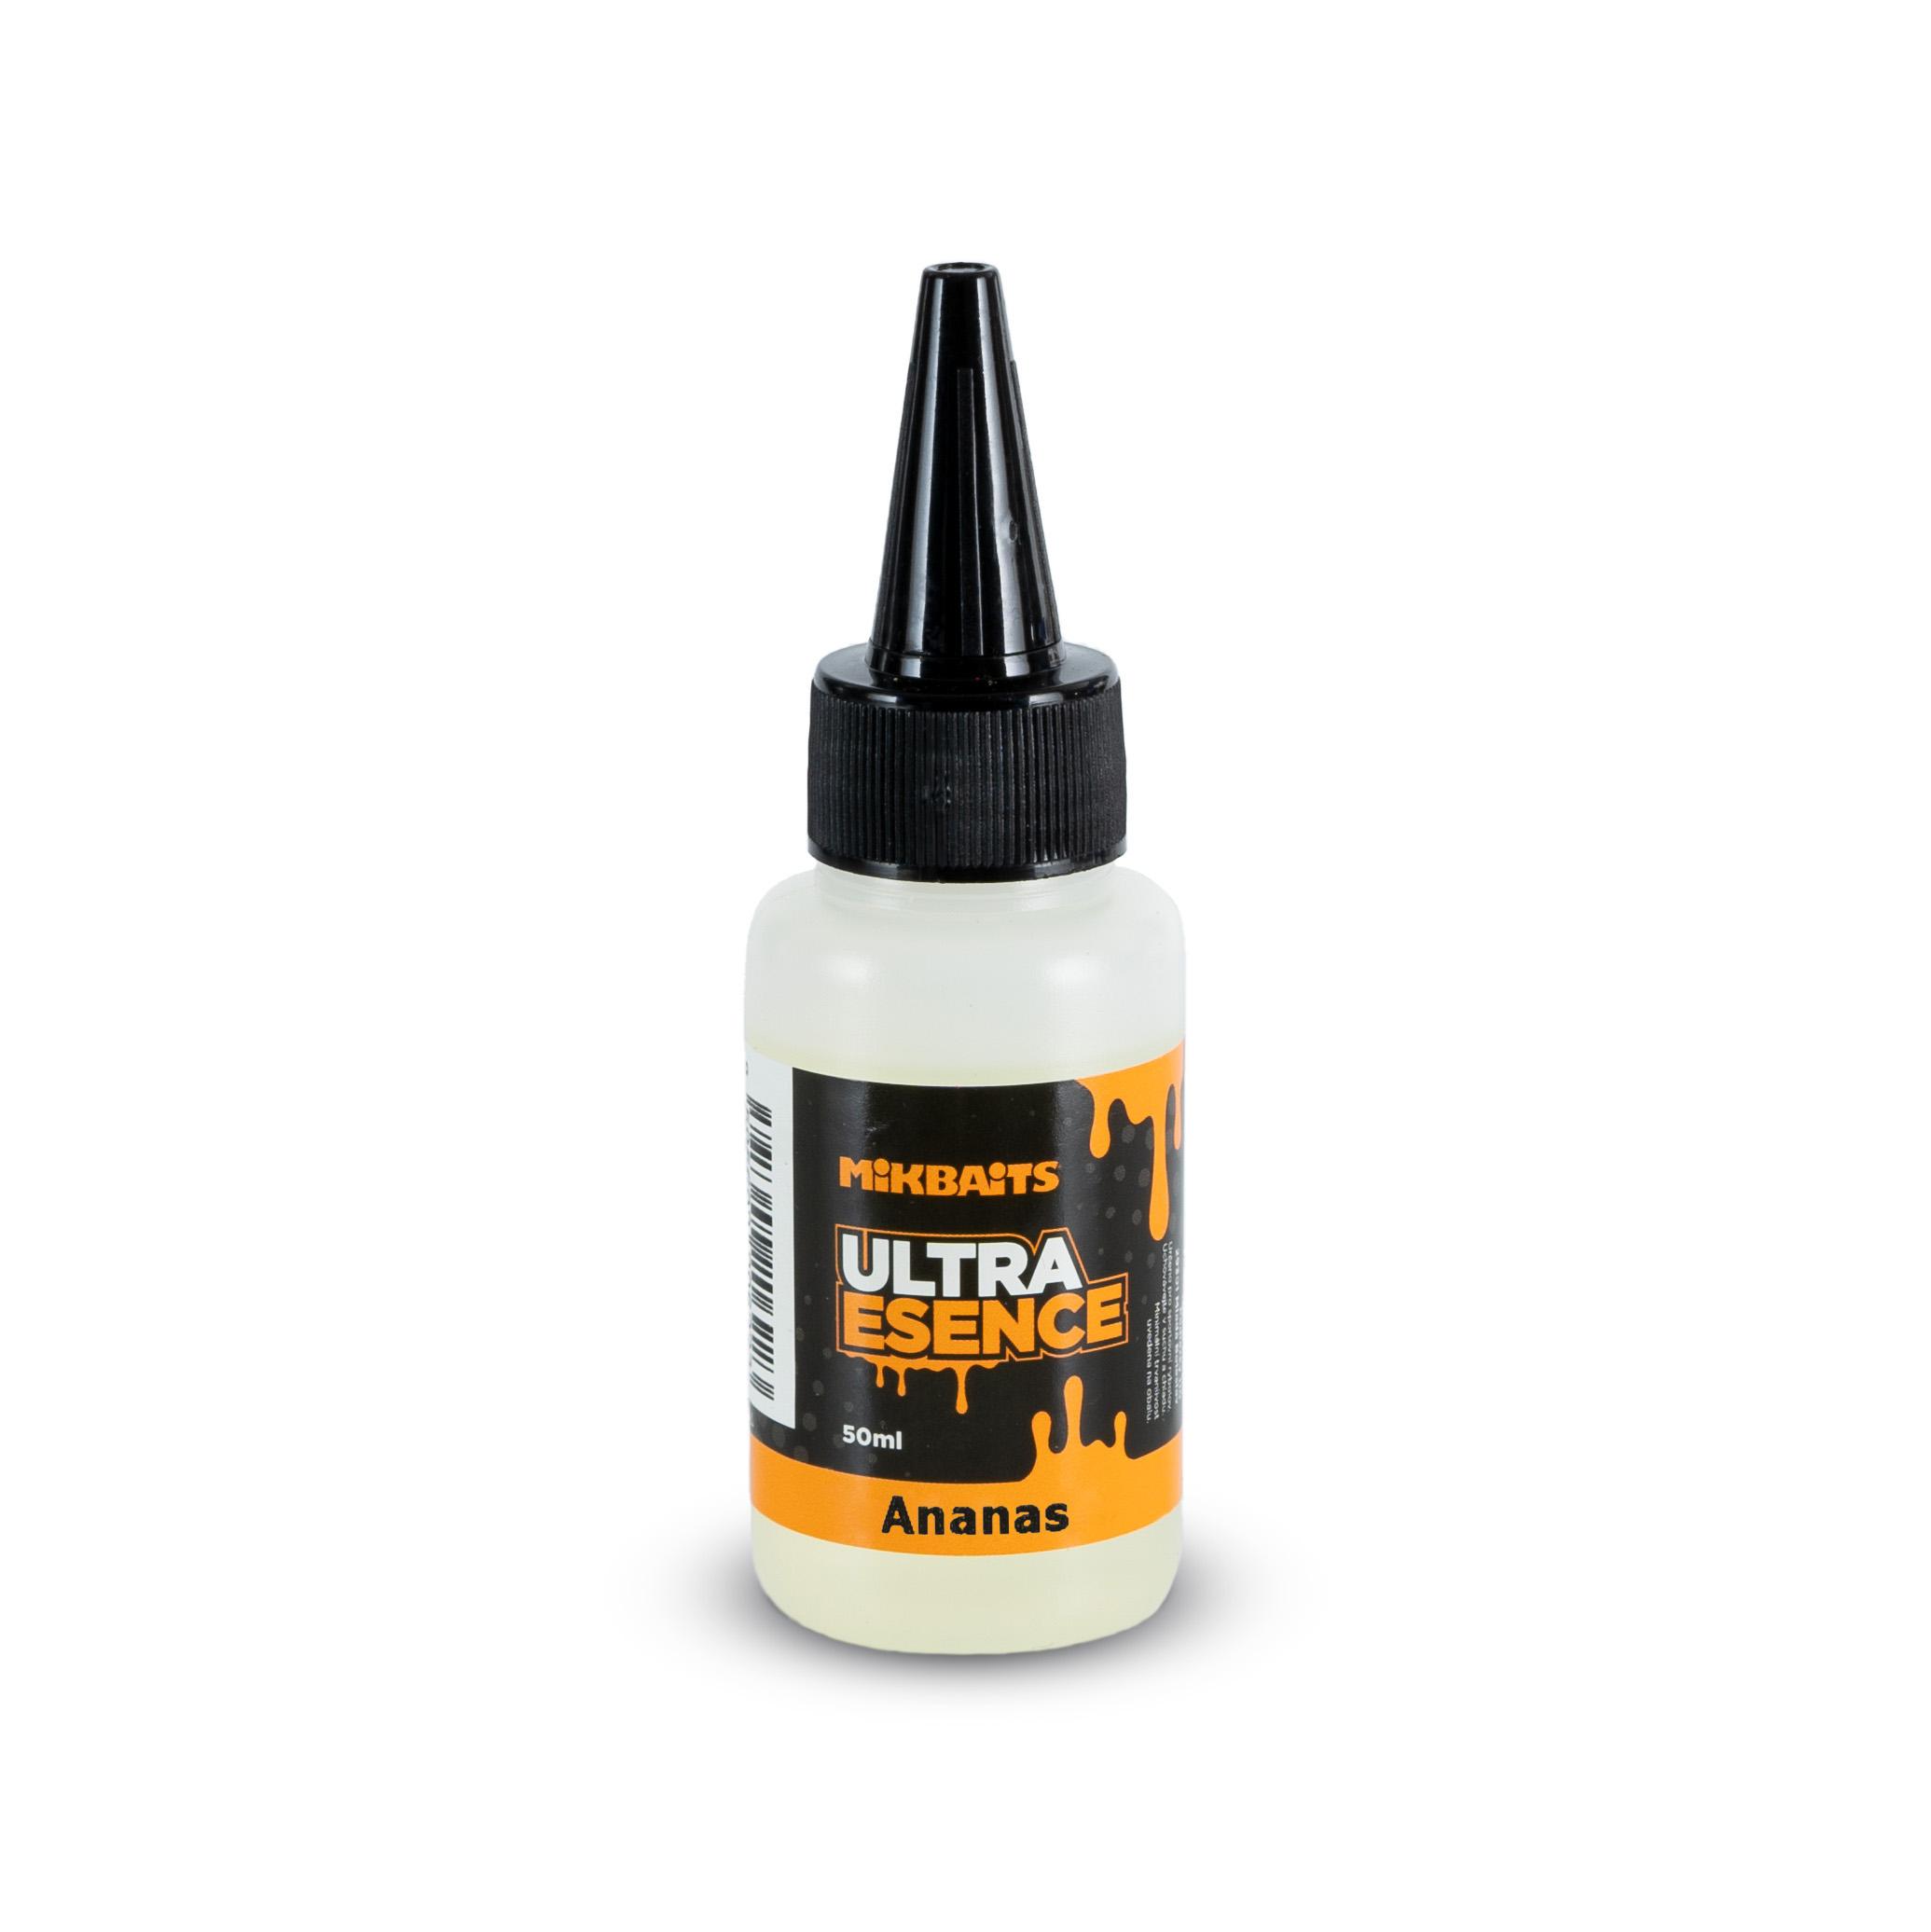 Ultra esence 50ml - Ananas